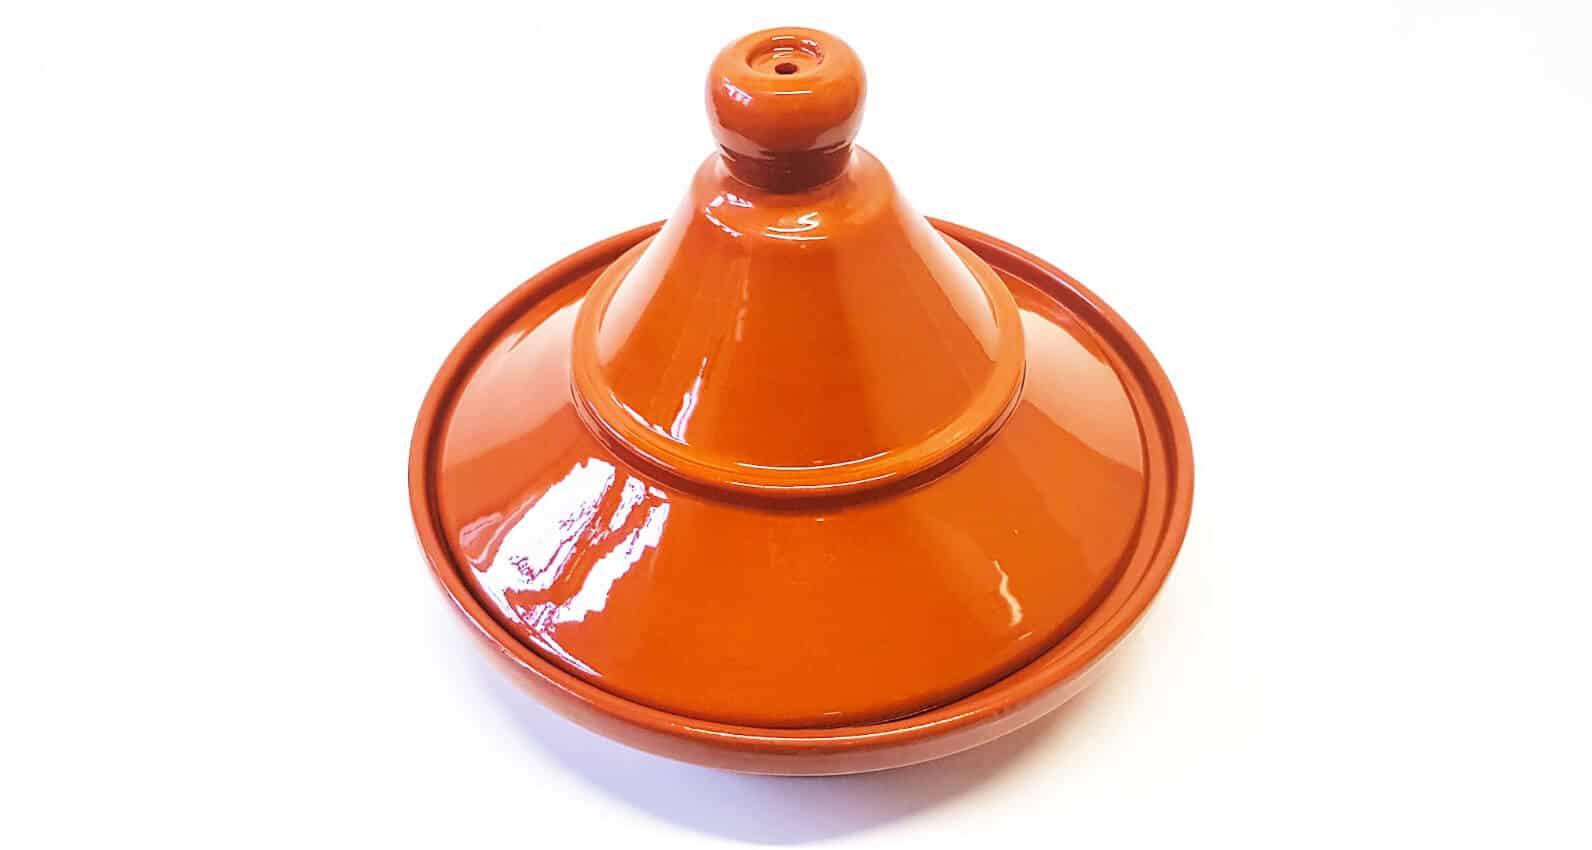 Verano-Spanish-Ceramics-El-Toro-Collection-Tagine-2